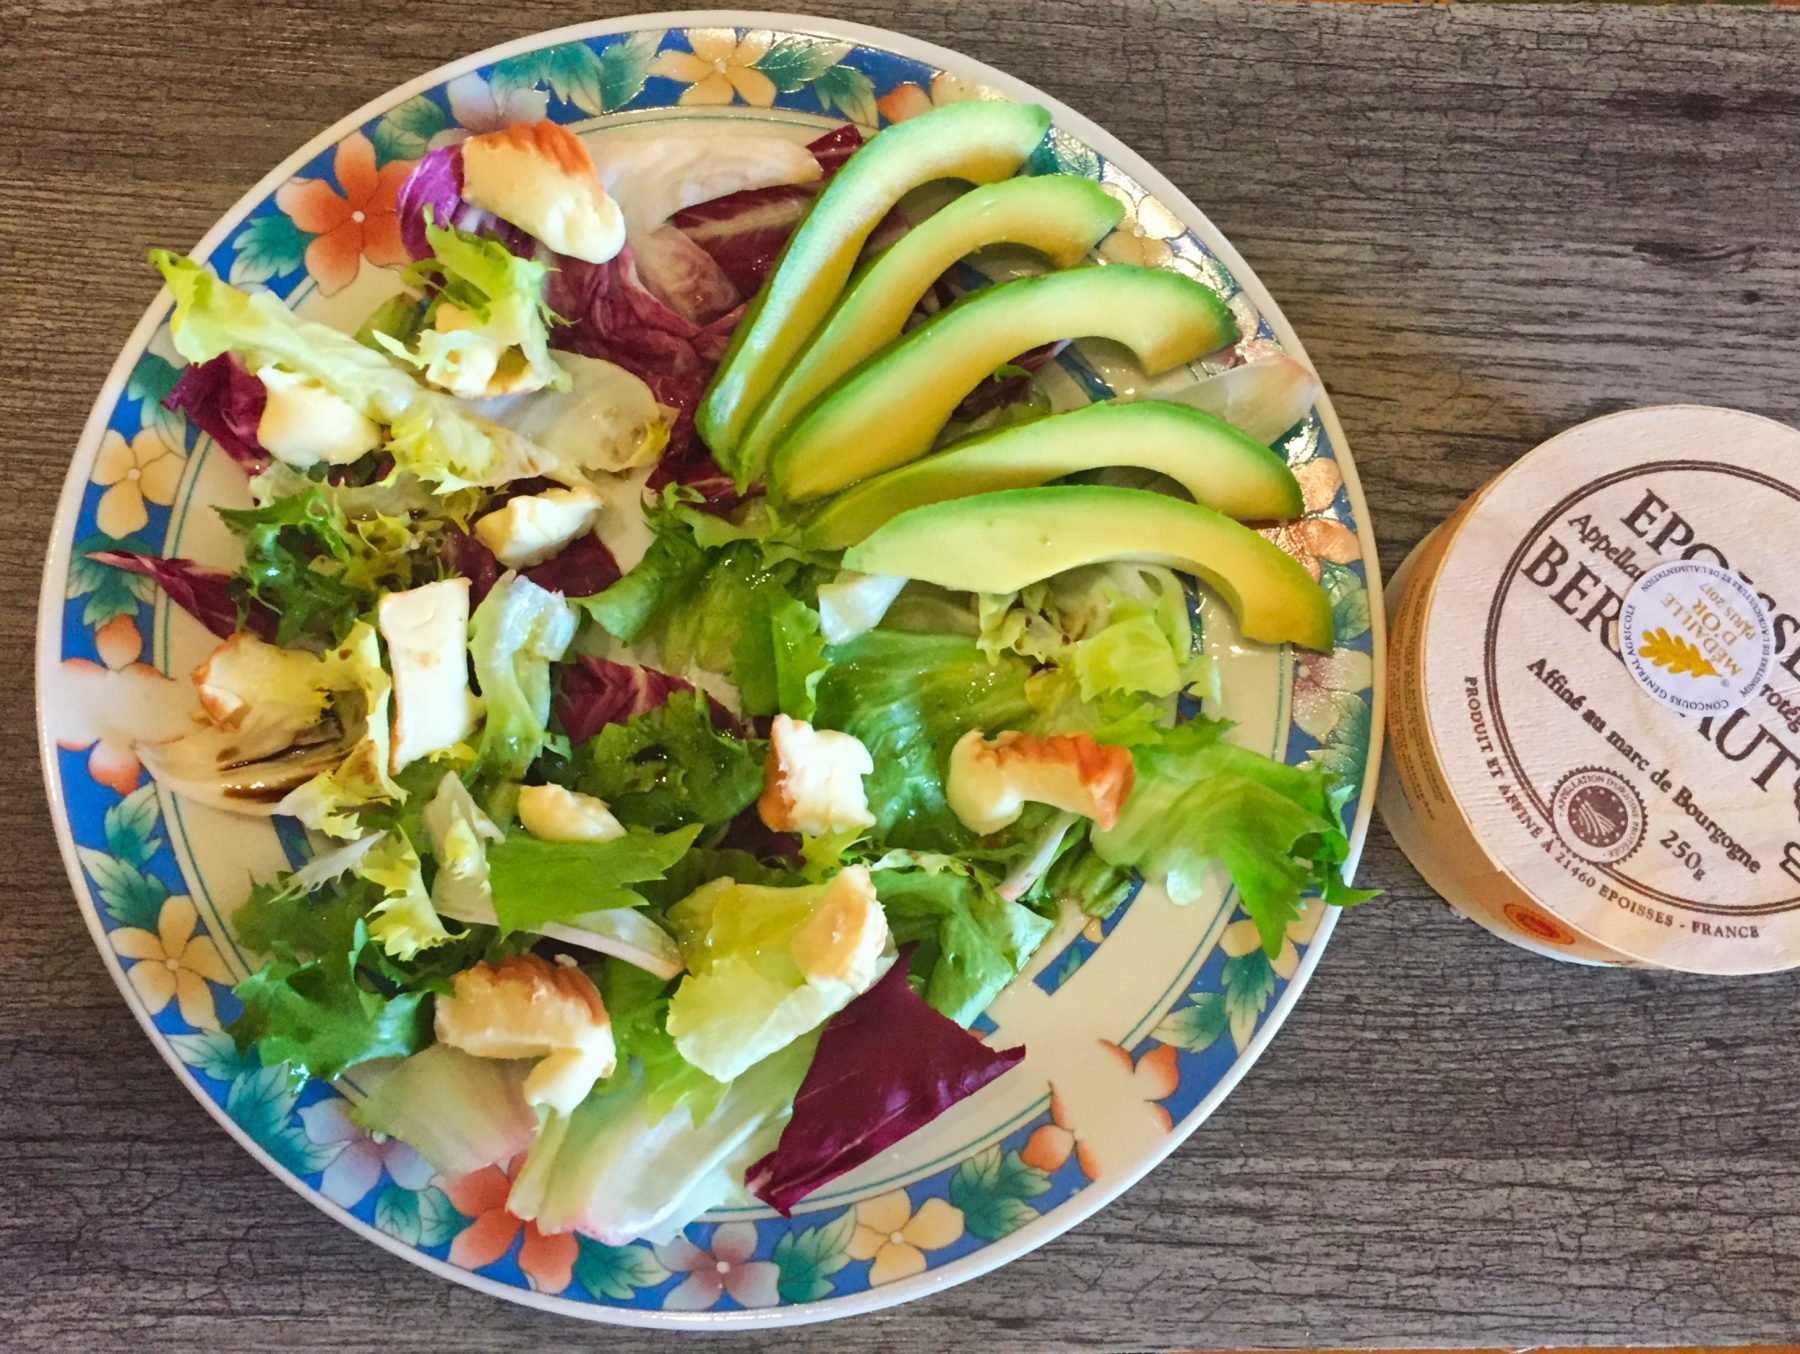 IMG 3485 - Salade boeuf, époisses, tomates et avocat